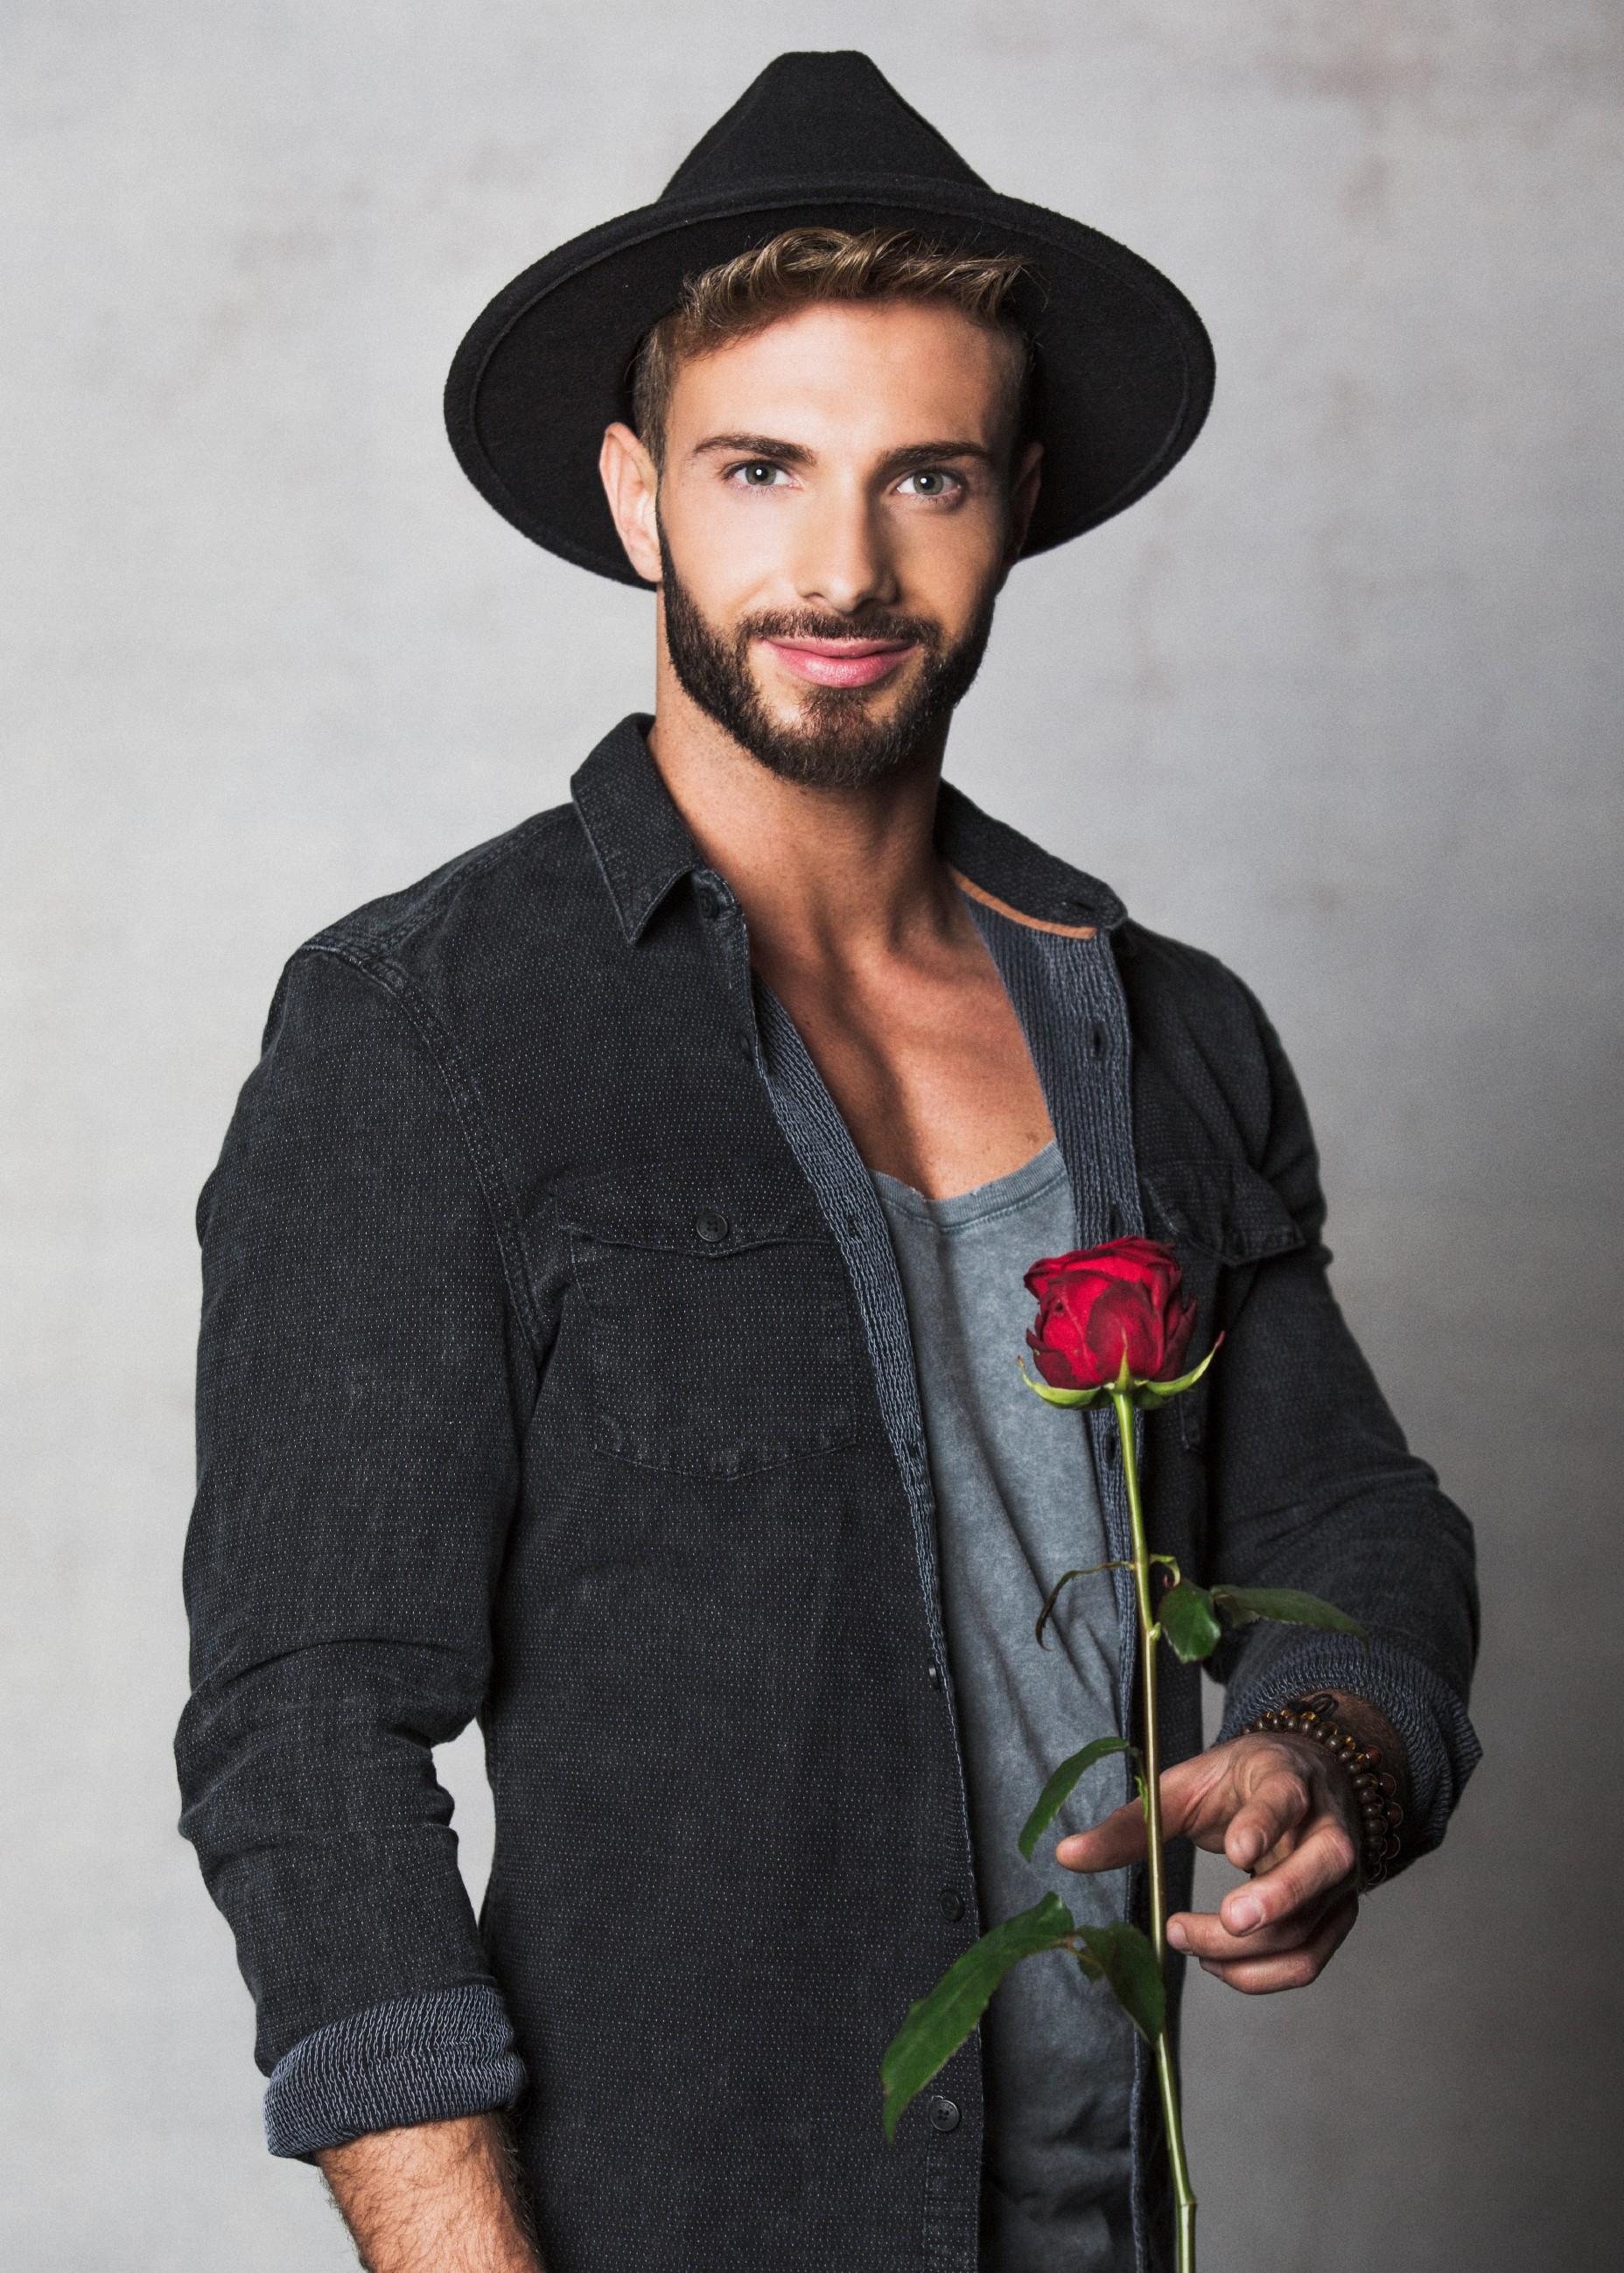 Julian Bachelorette